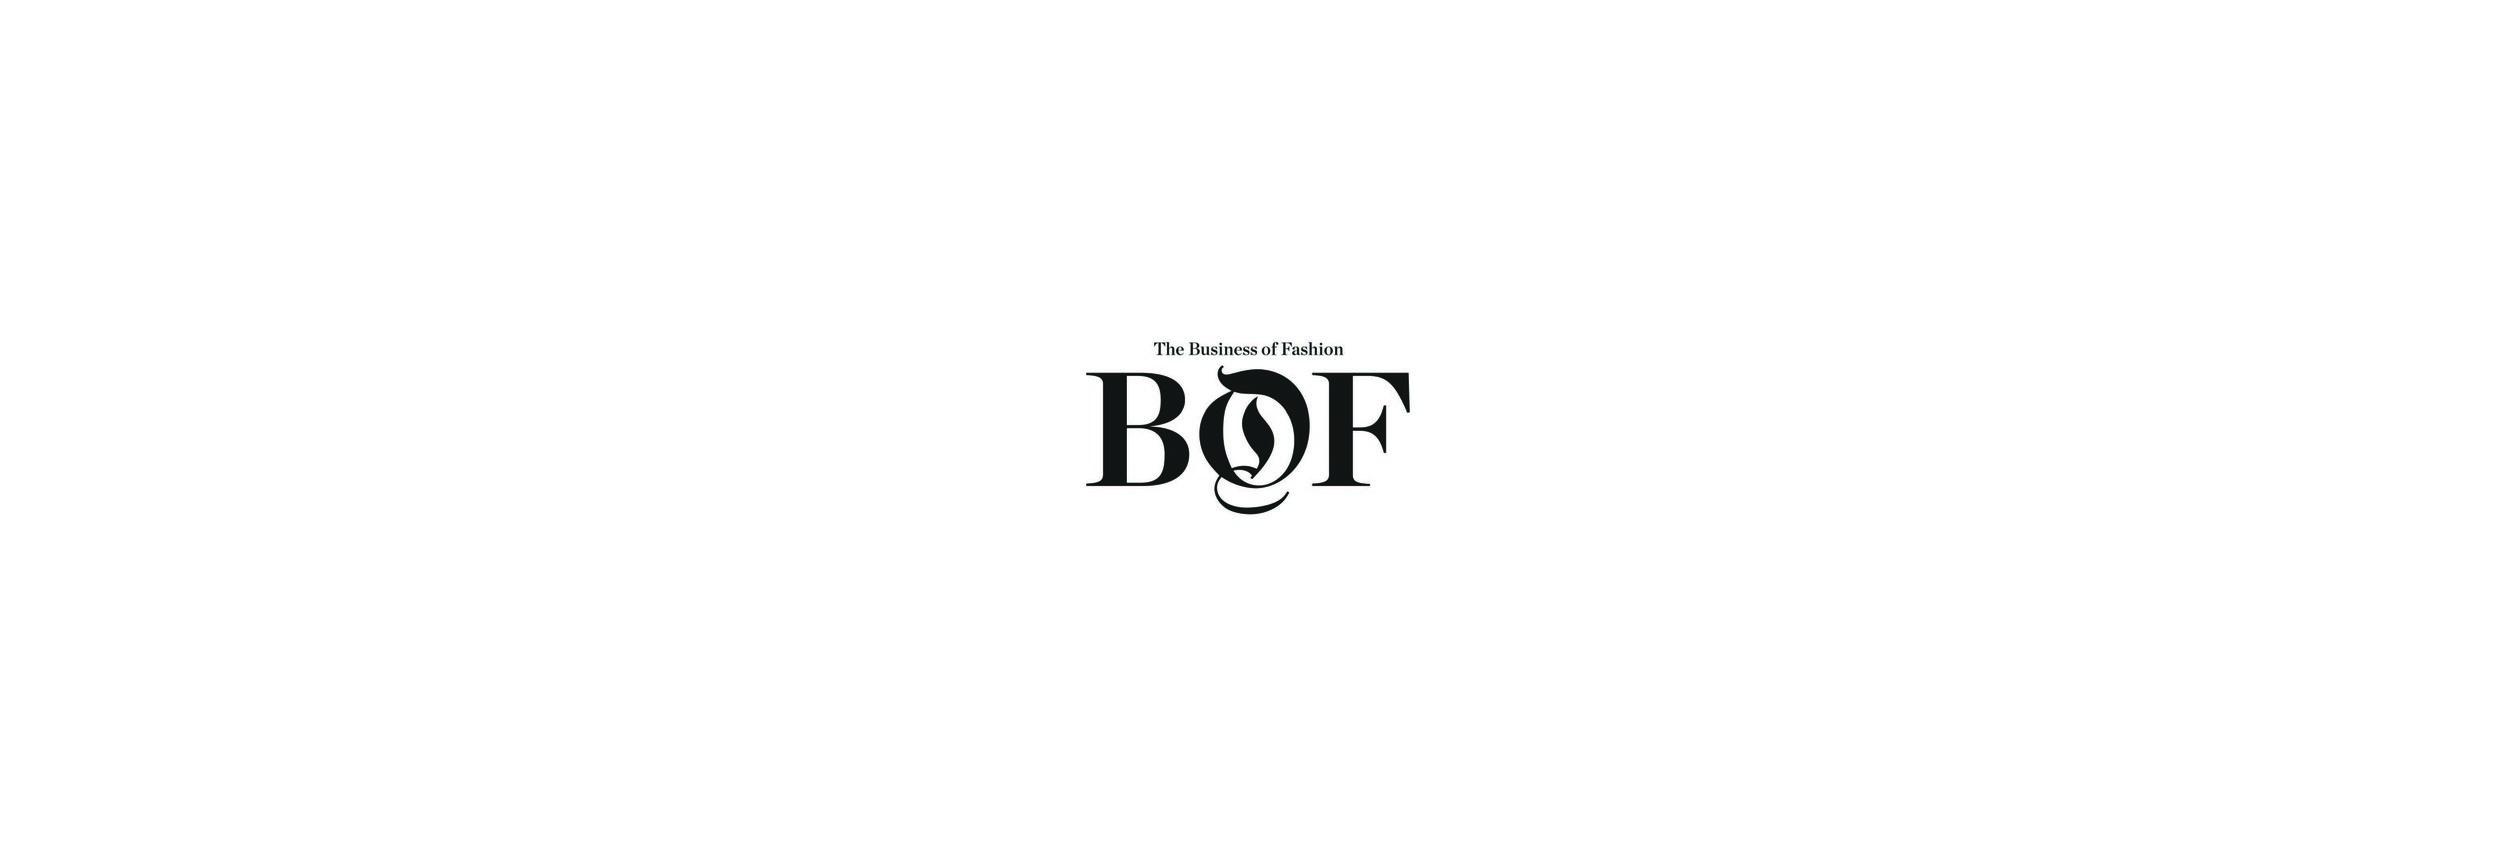 BOF.jpg